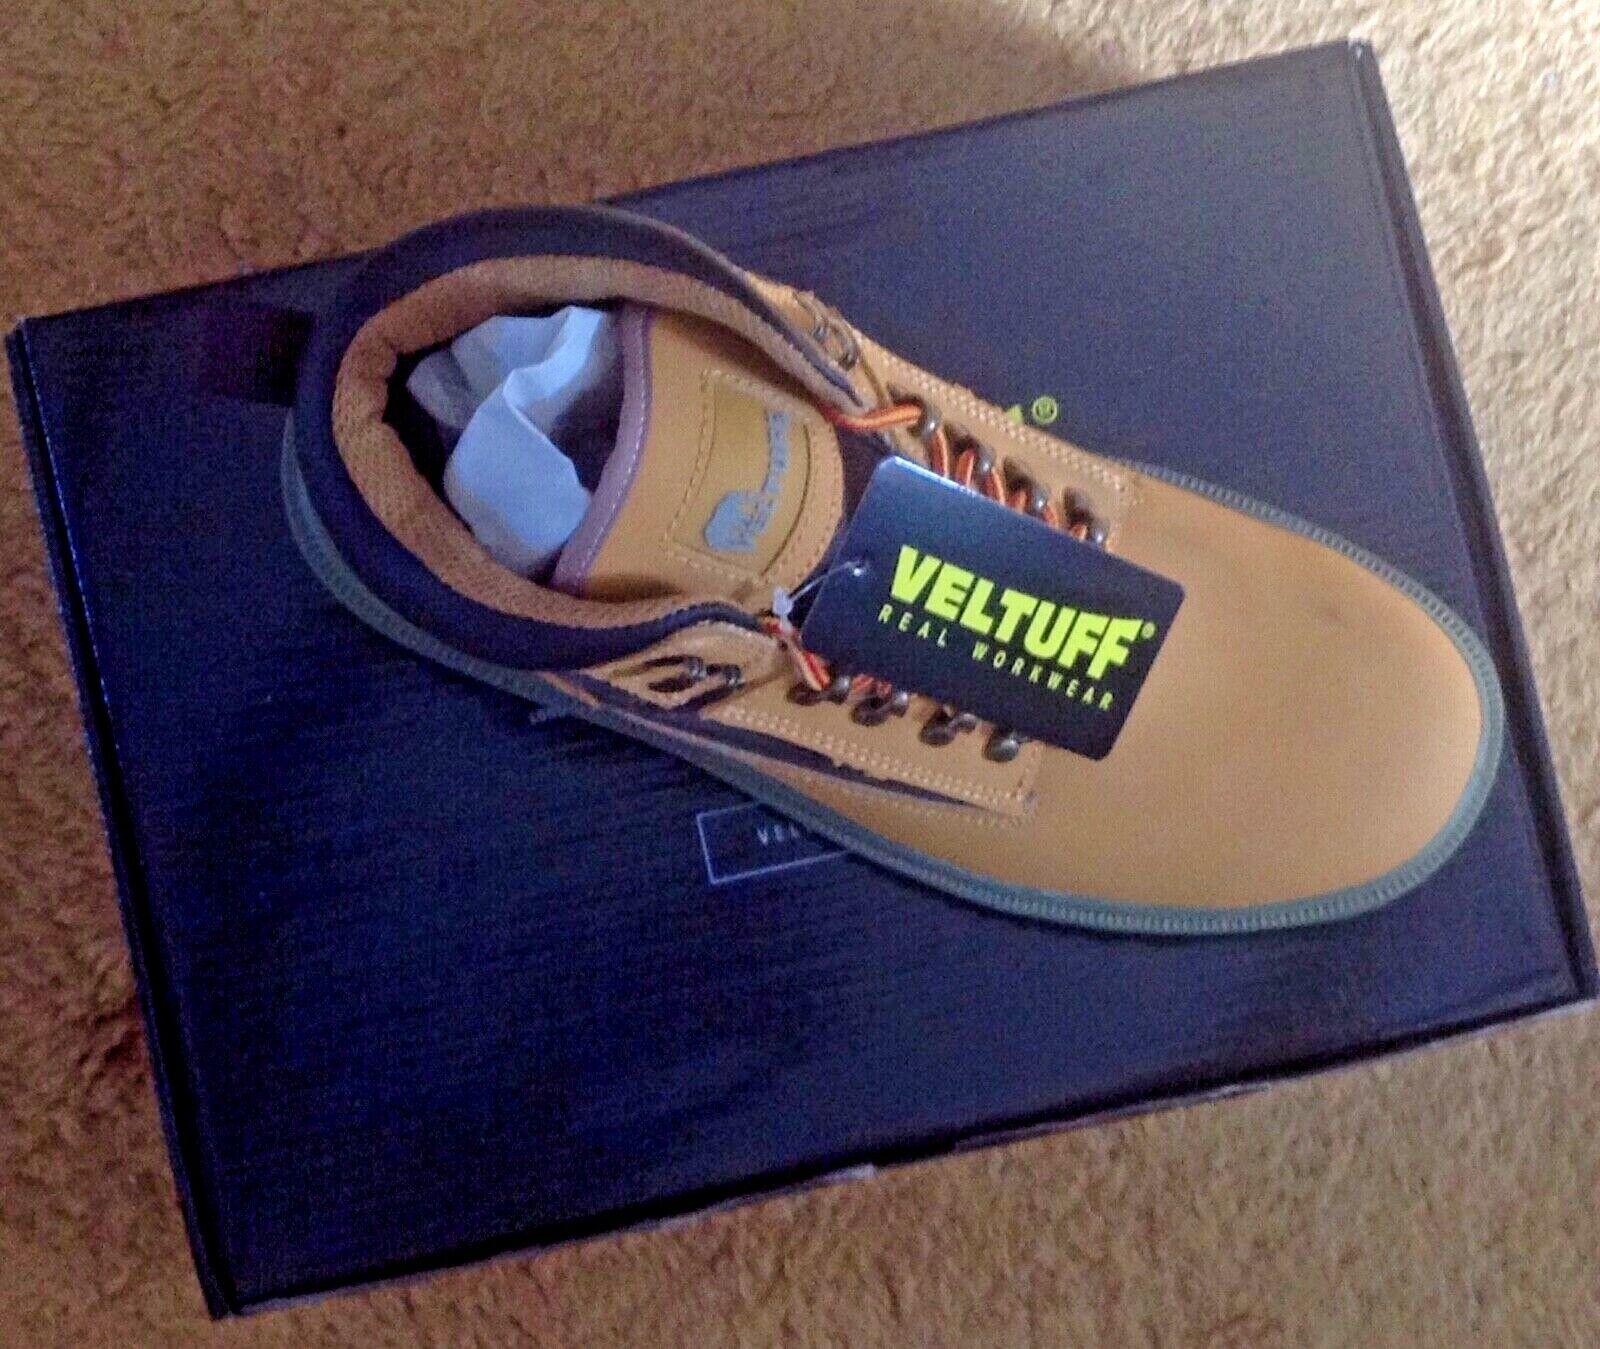 VELTUFF® Real Workwear Safety Boots SIP SRC VF9642